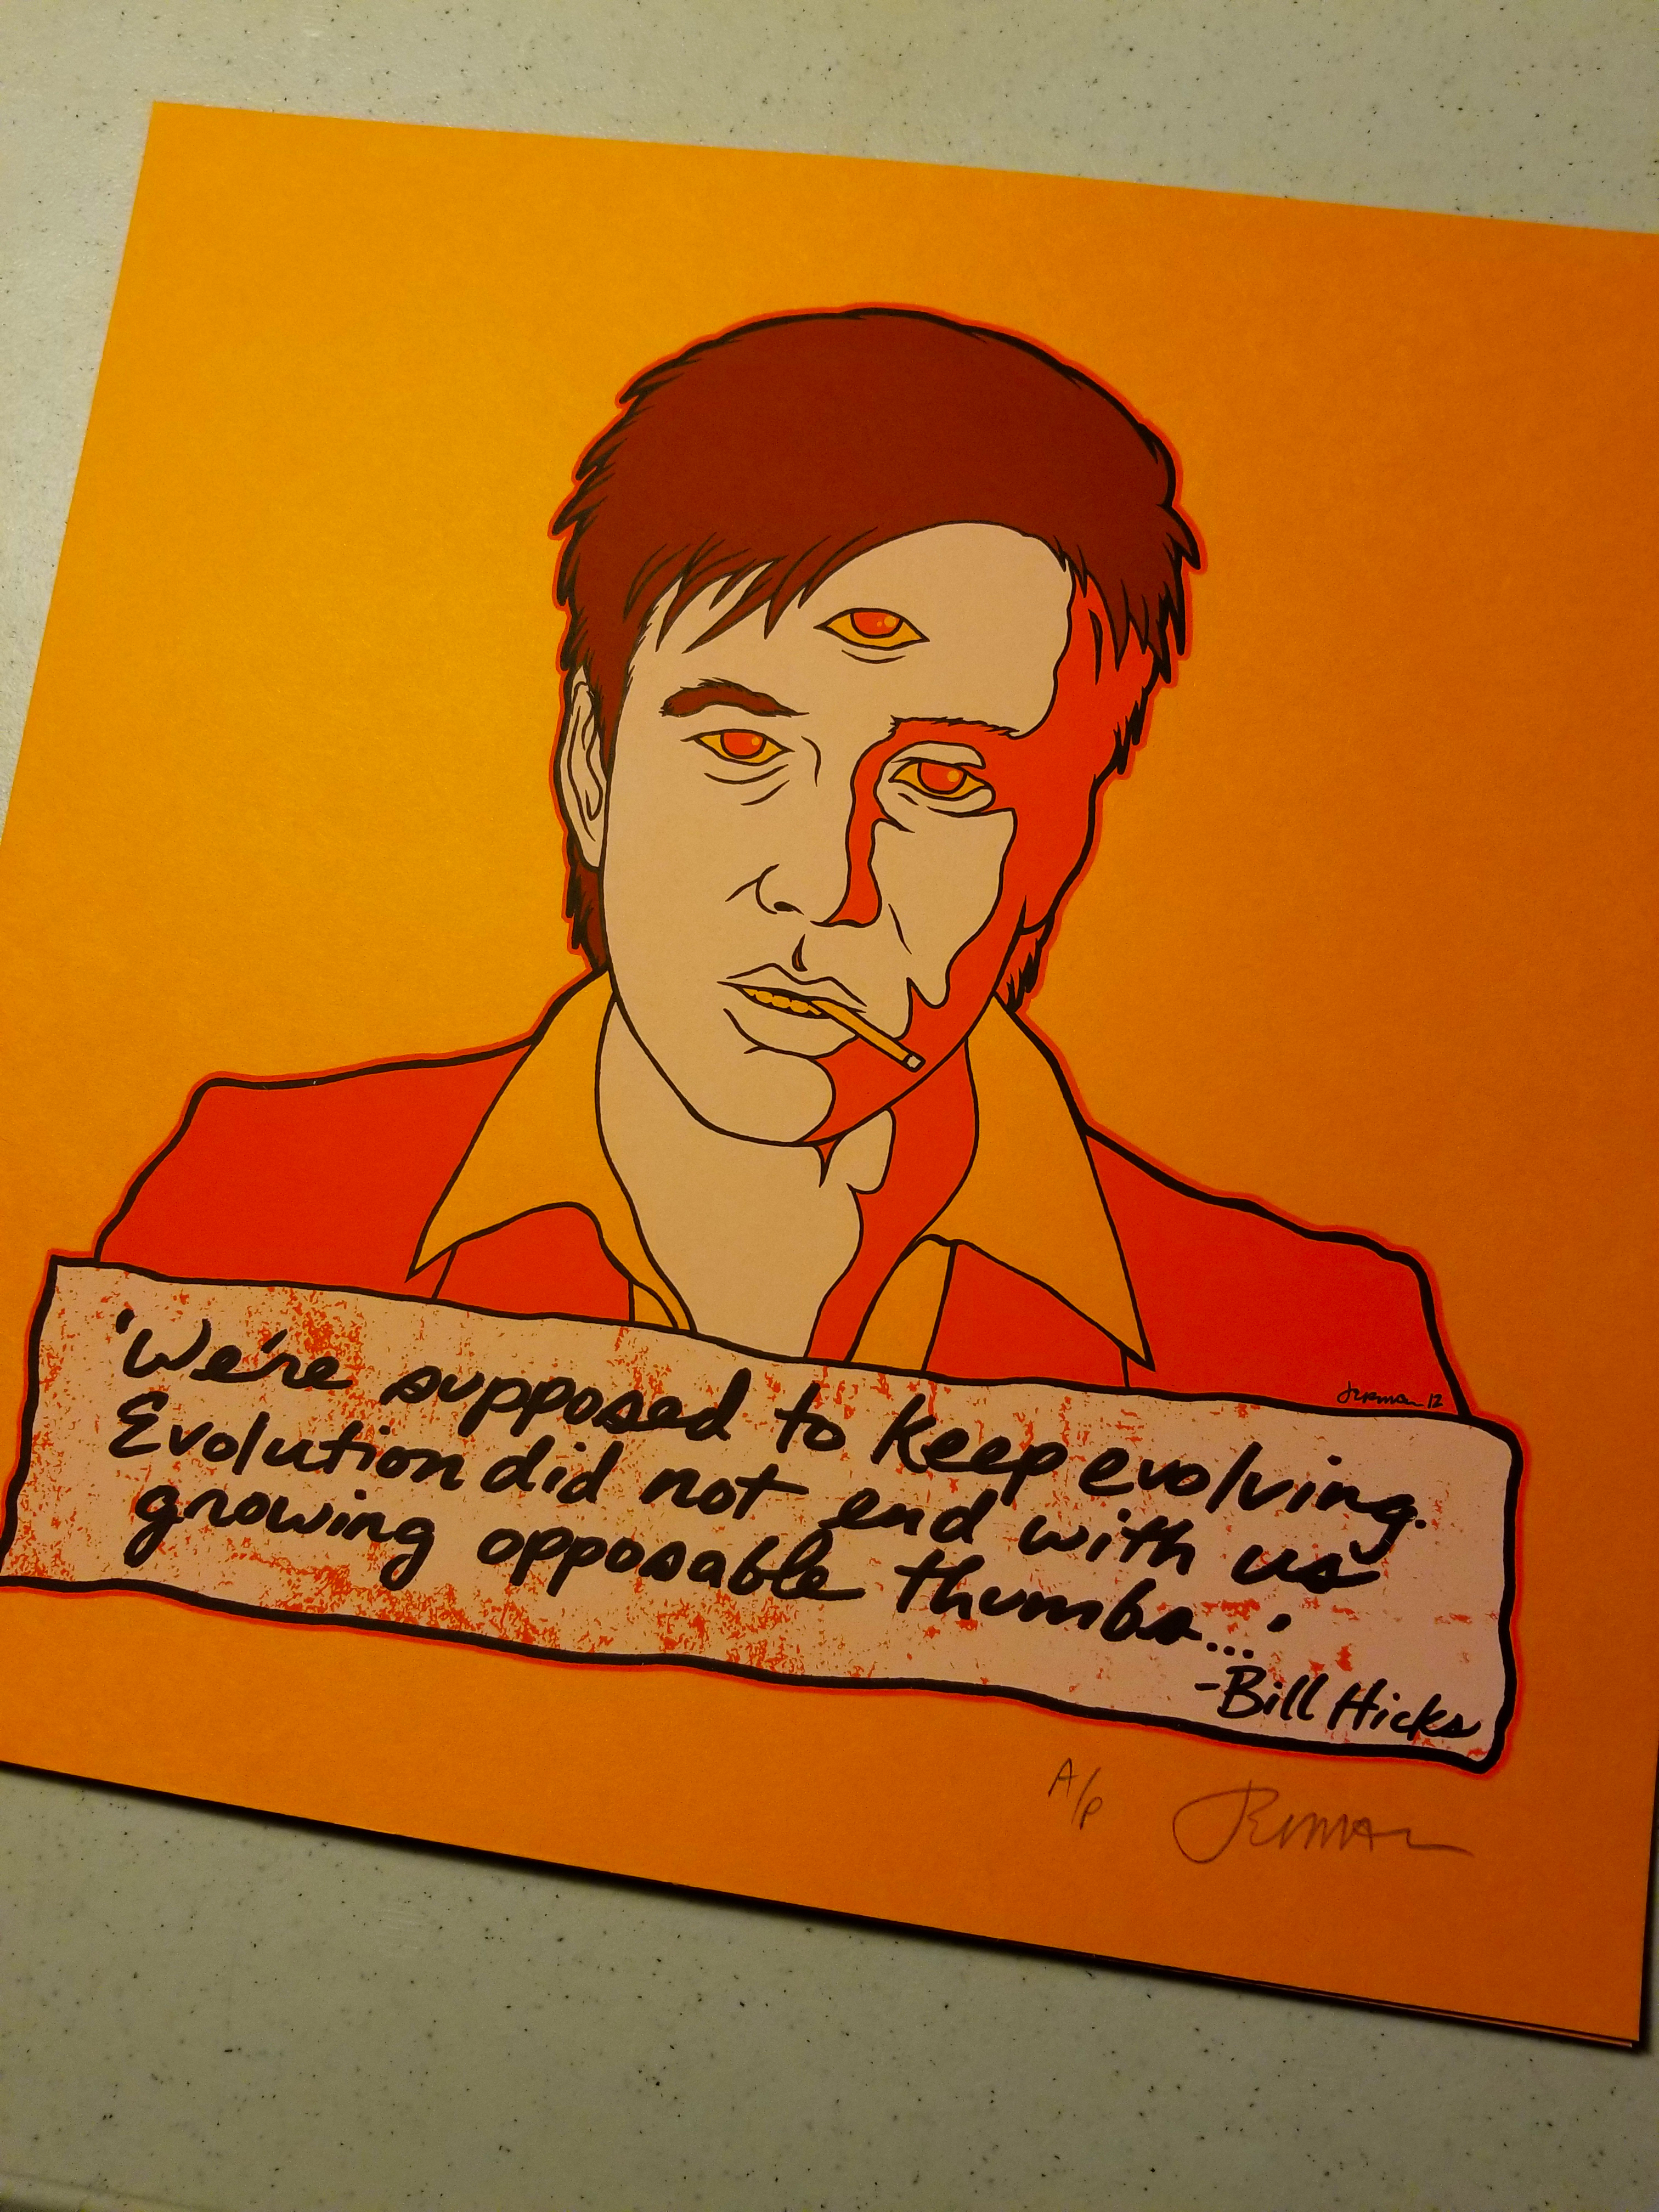 - Bill Hicks 'TEACHER' Mini Print 'EVOLUTION' (Orange Cream, Mustard, & Sparkle Foil Variants) -